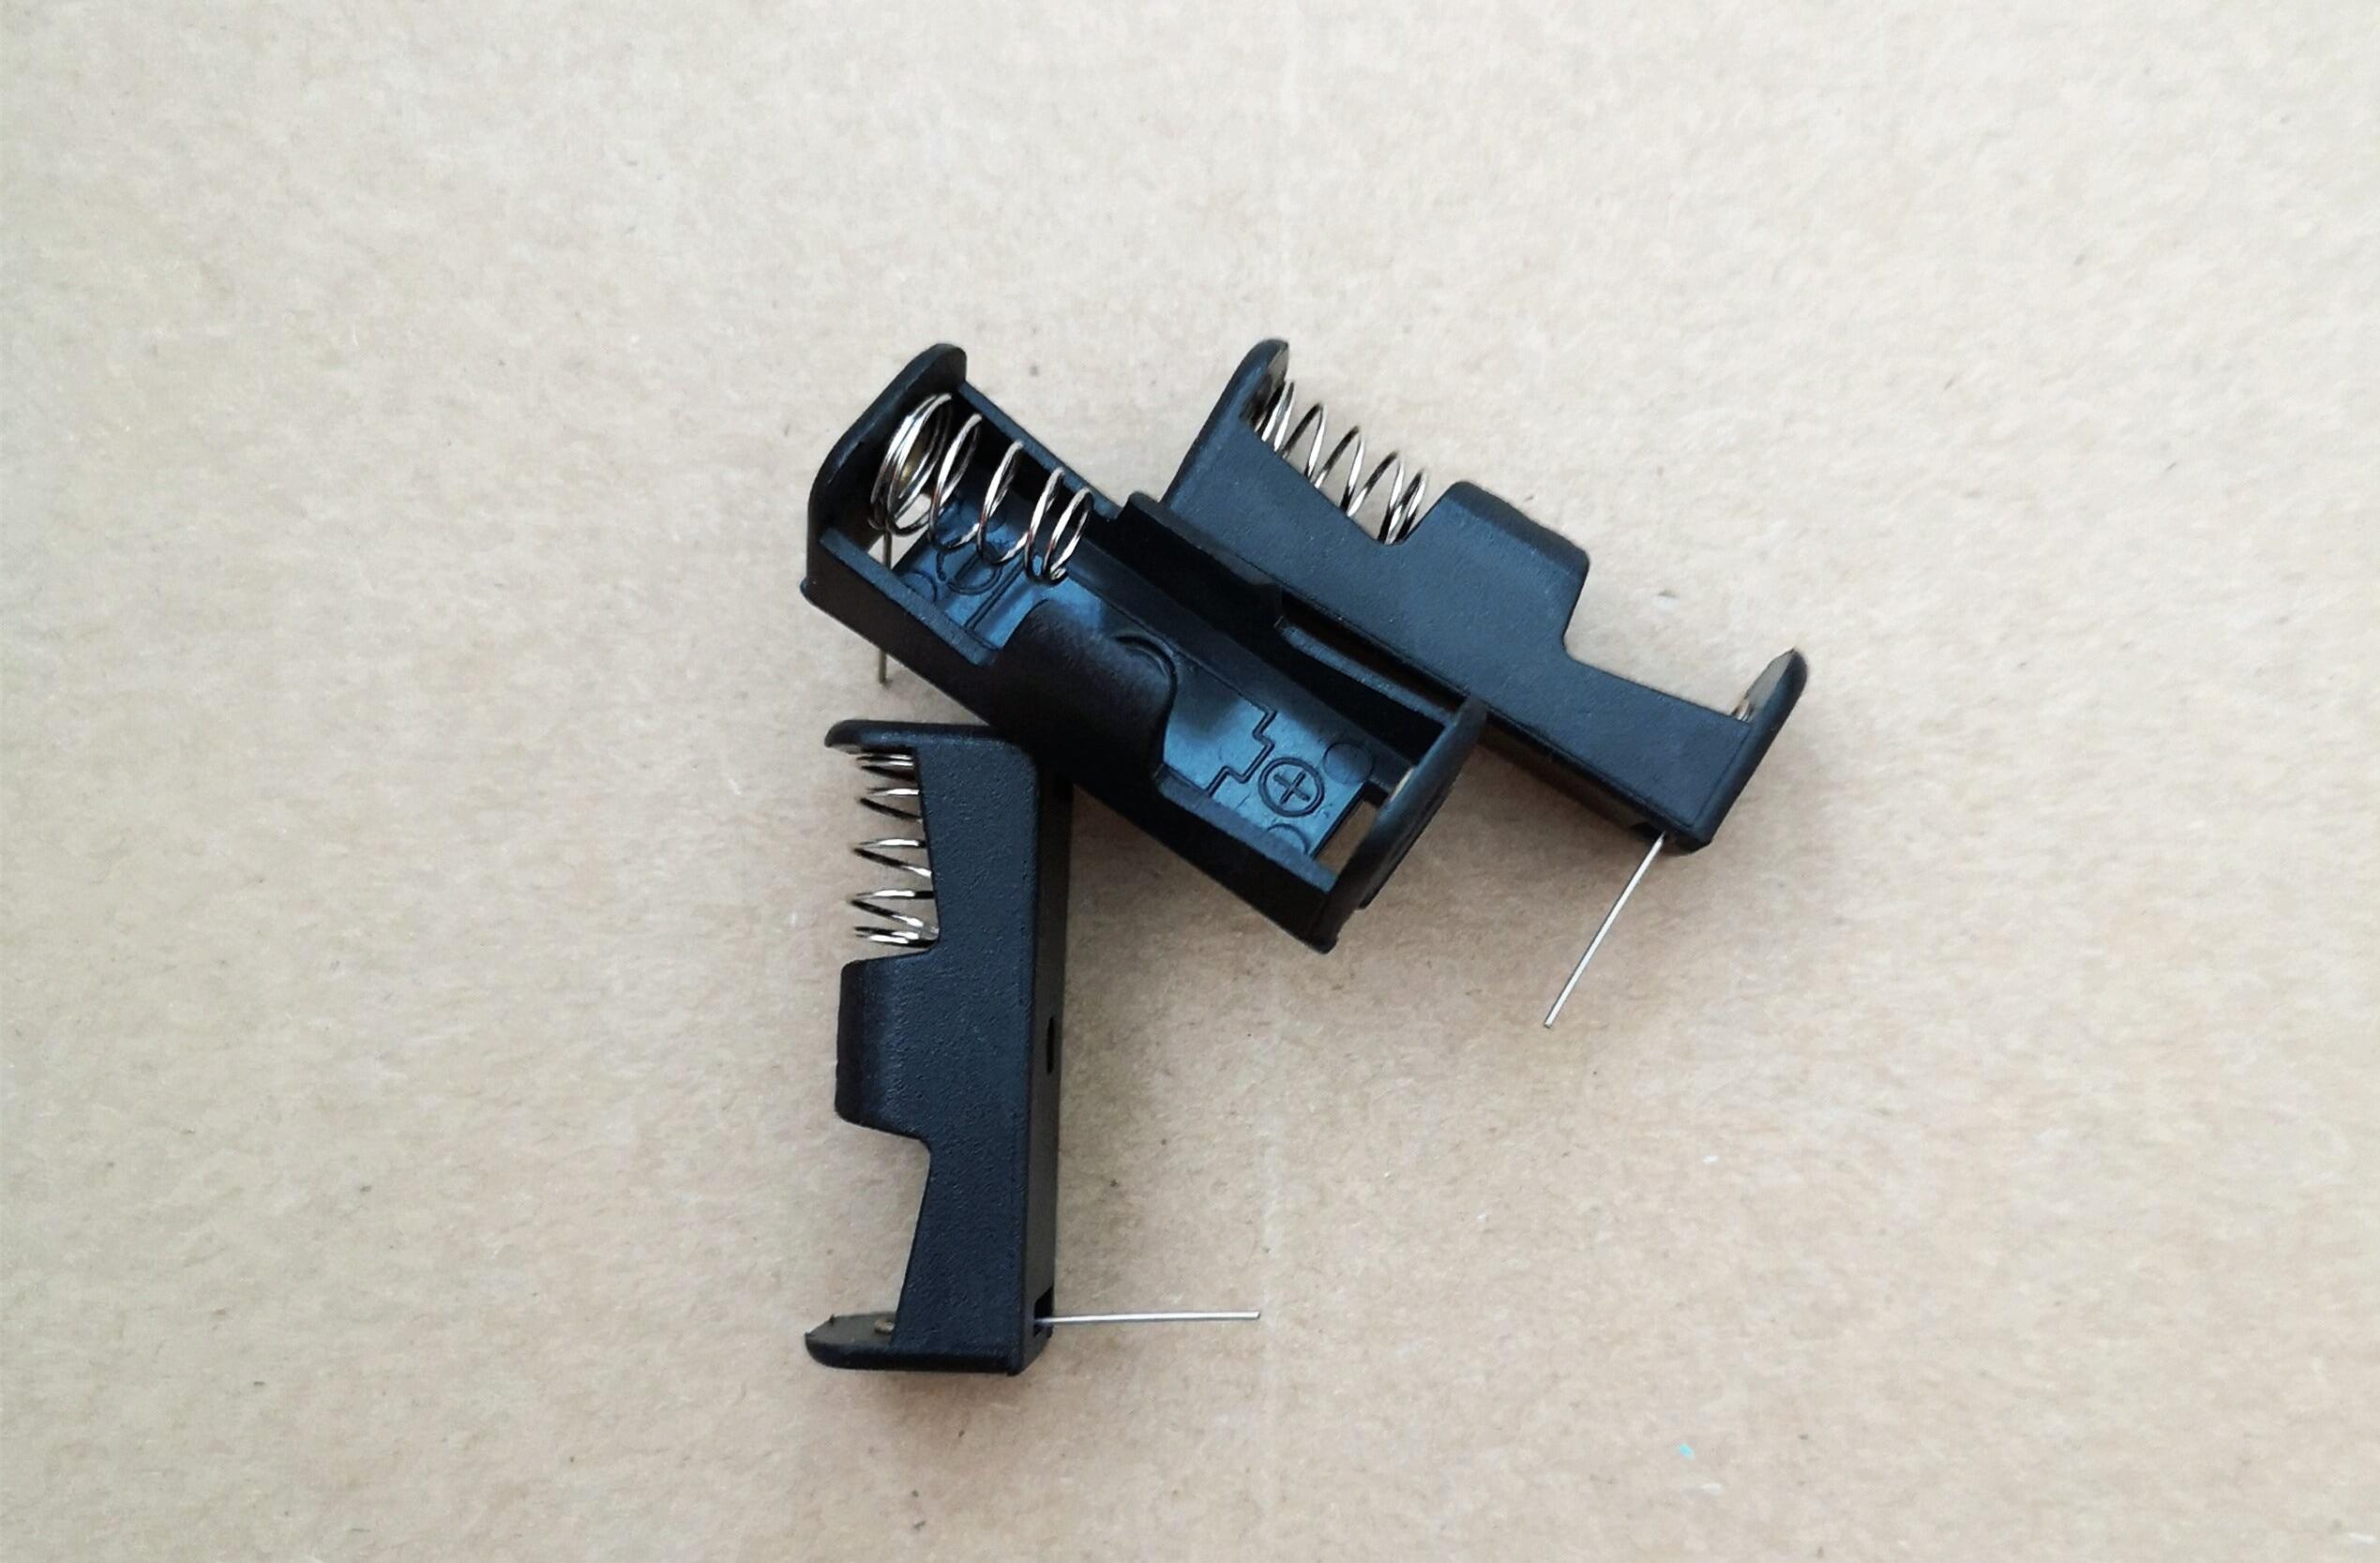 20PCS 12V 23A Pin Zellen Batterie halter 12V Clip Halter Fall A23 Schwarz N Türklingel fernbedienung anschlüsse